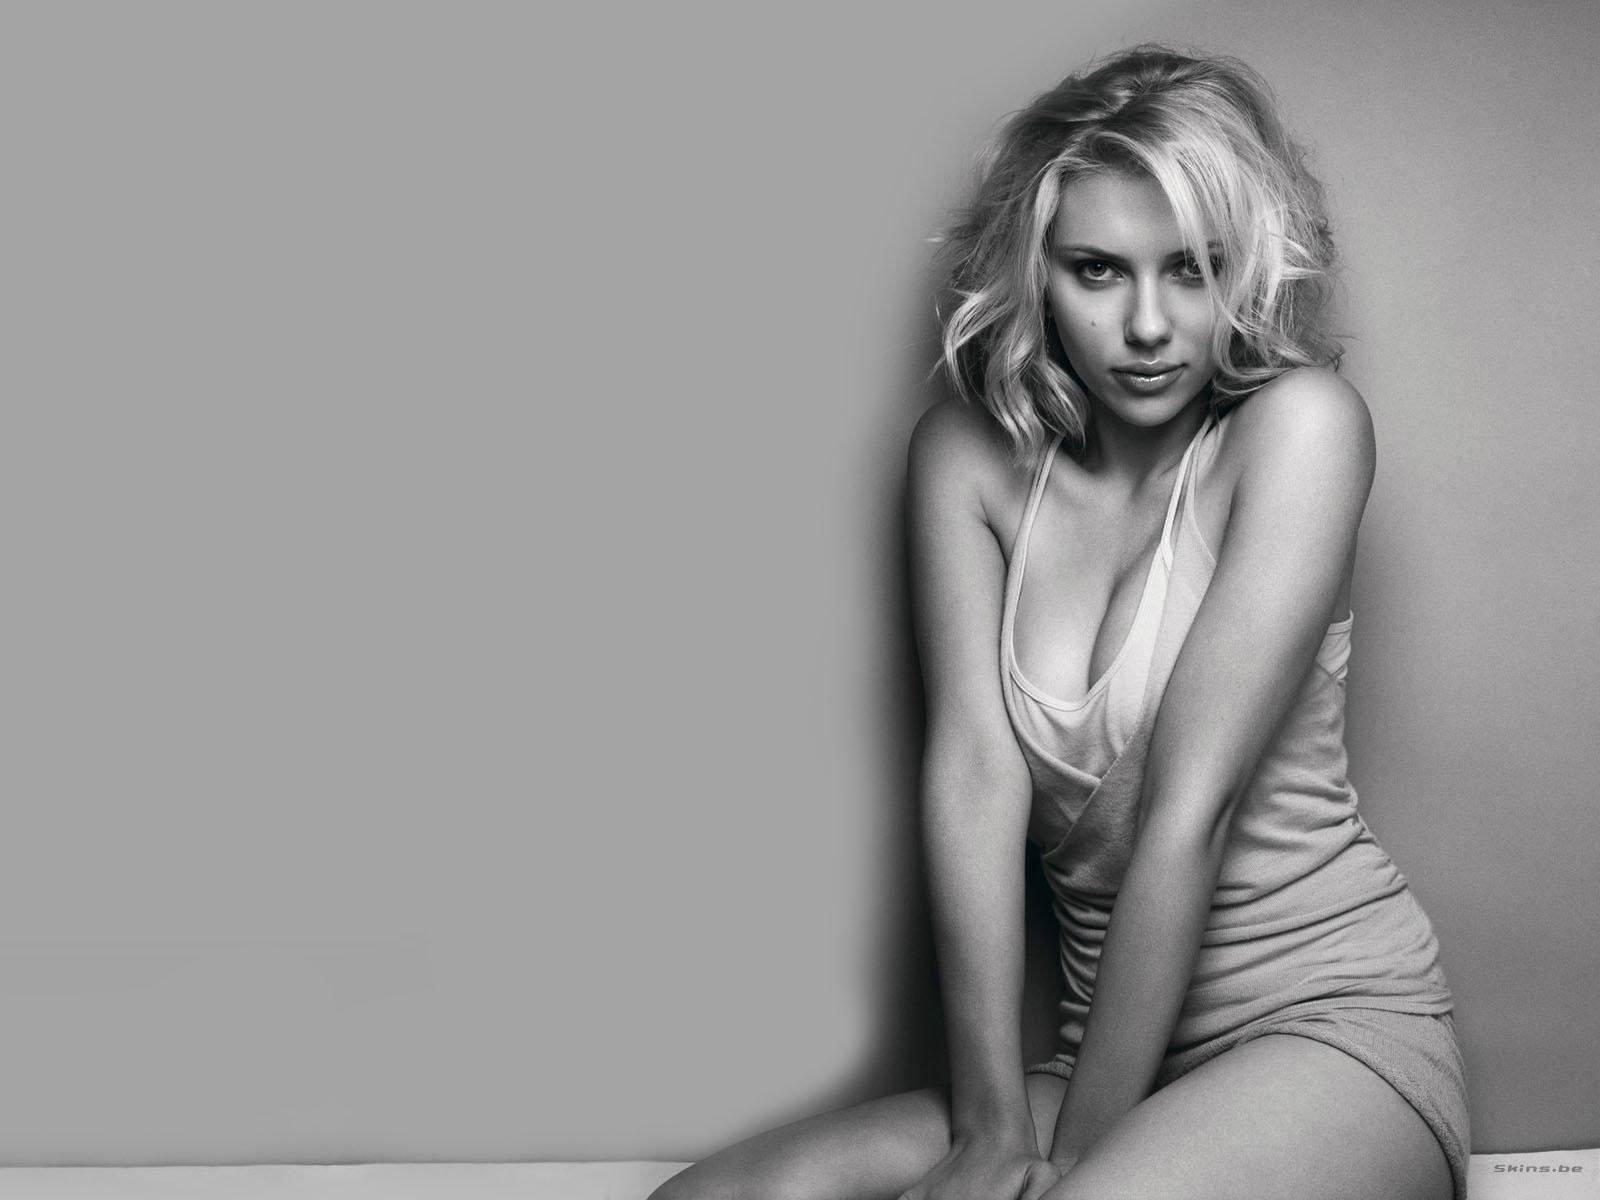 CONG COK: Scarlett Johansson HD Wallpapers 1600x1200 Desktop Backgrounds